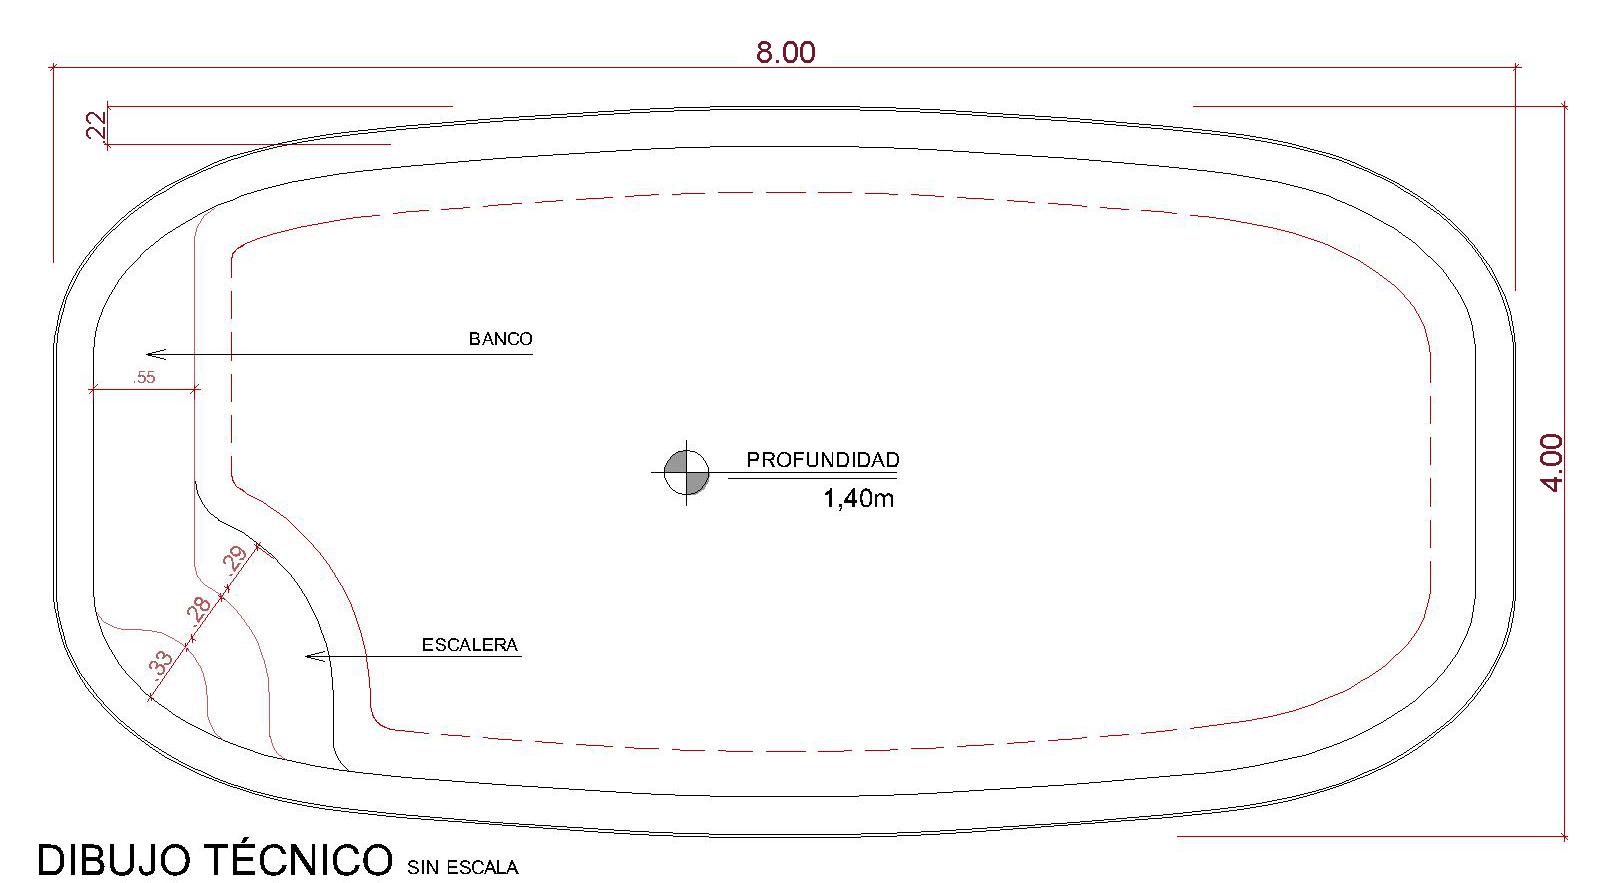 Dibujos técnicos Bríndice (sin escala)